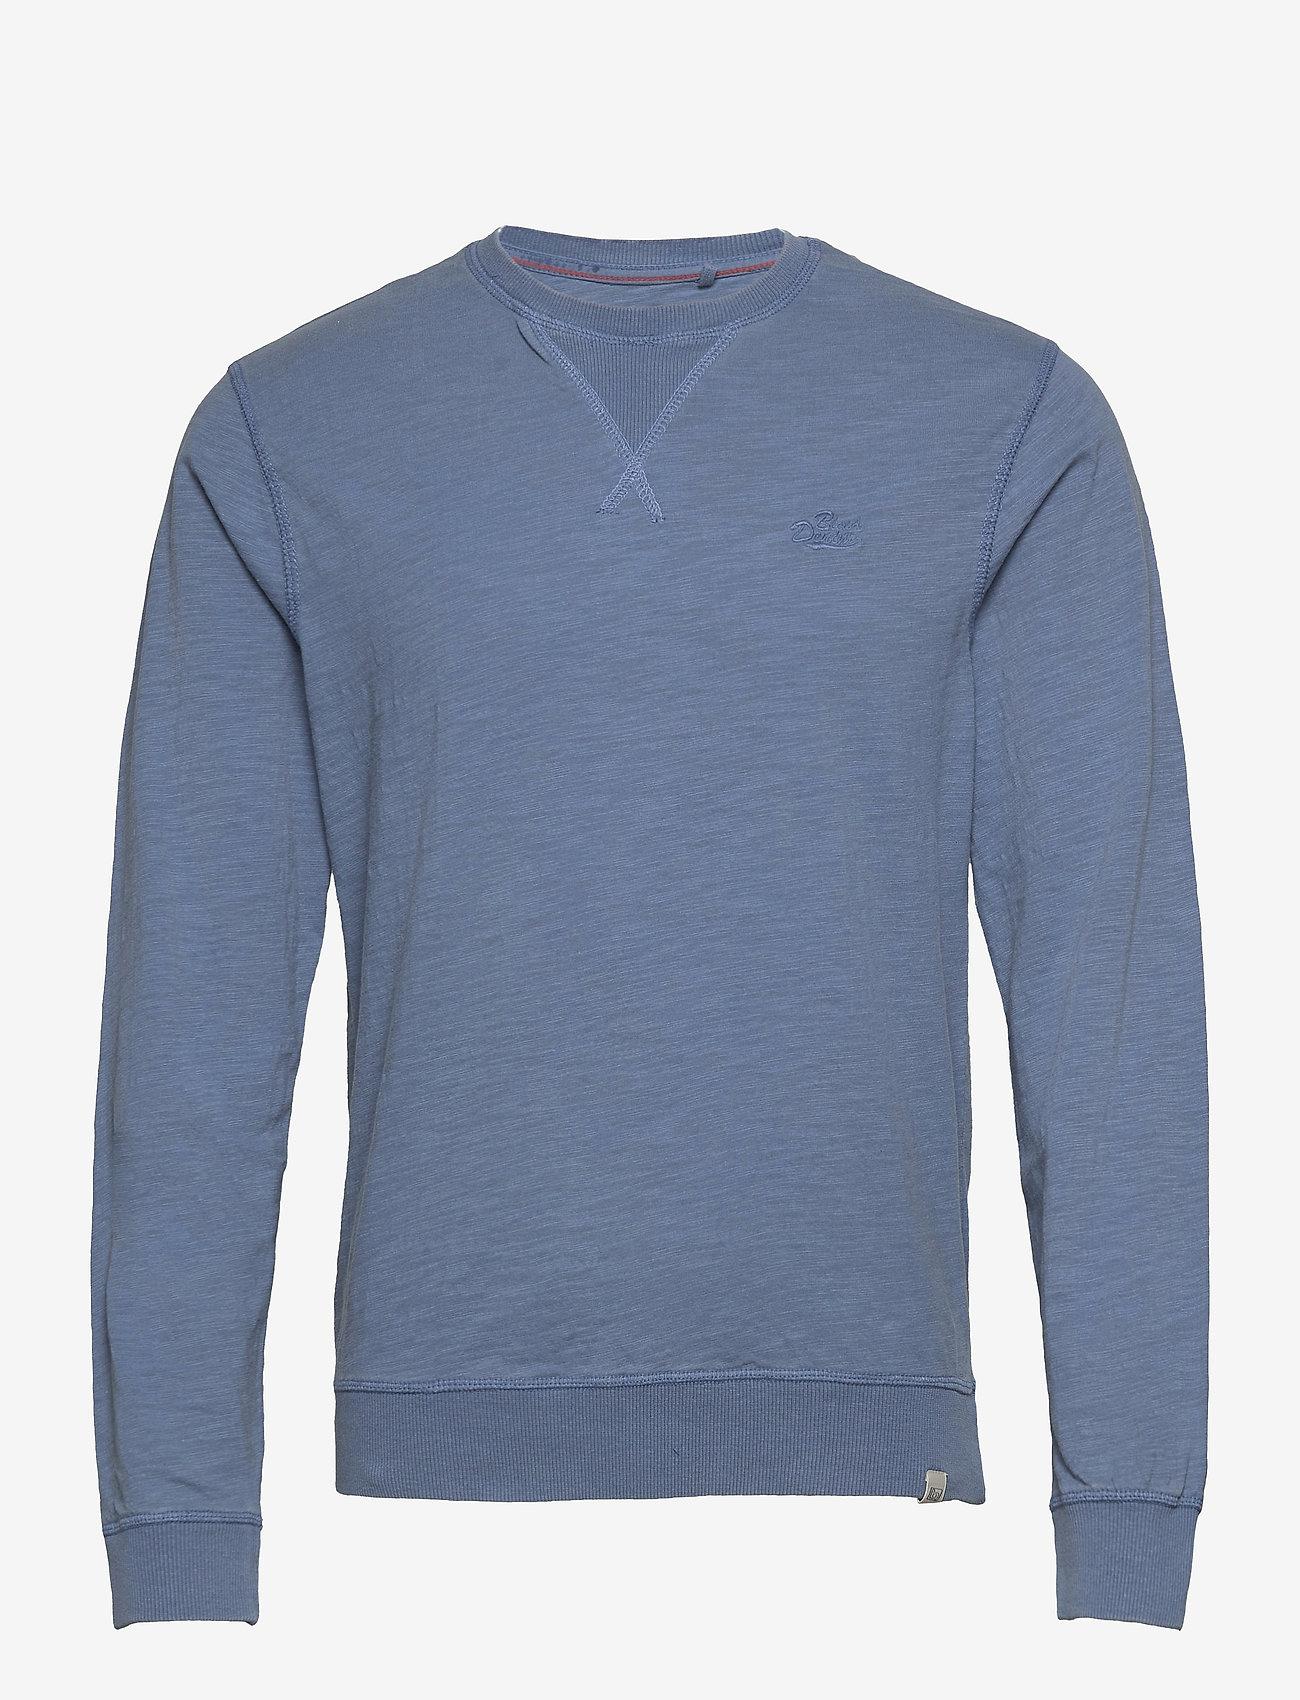 Blend - Sweatshirt - truien - moonlight blue - 0